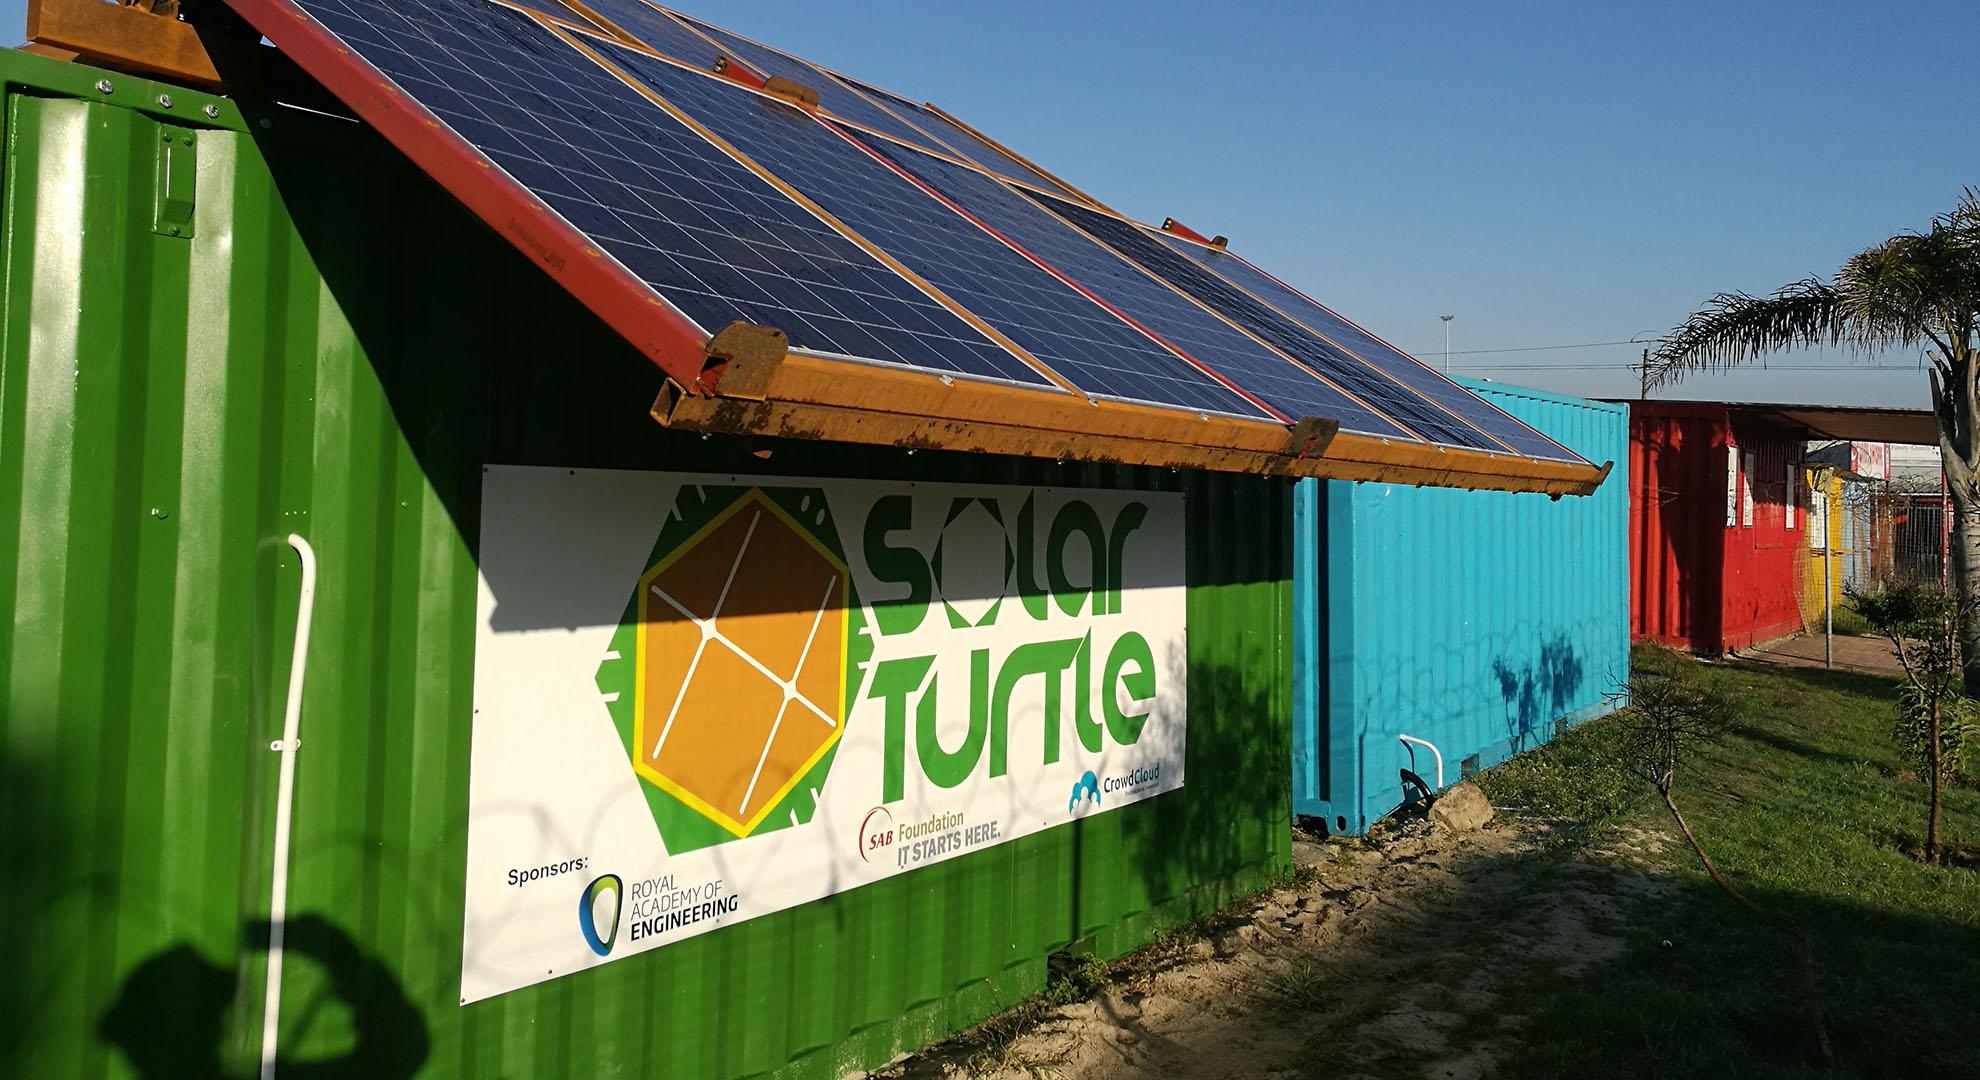 The Solar Turtle by James van der Walt